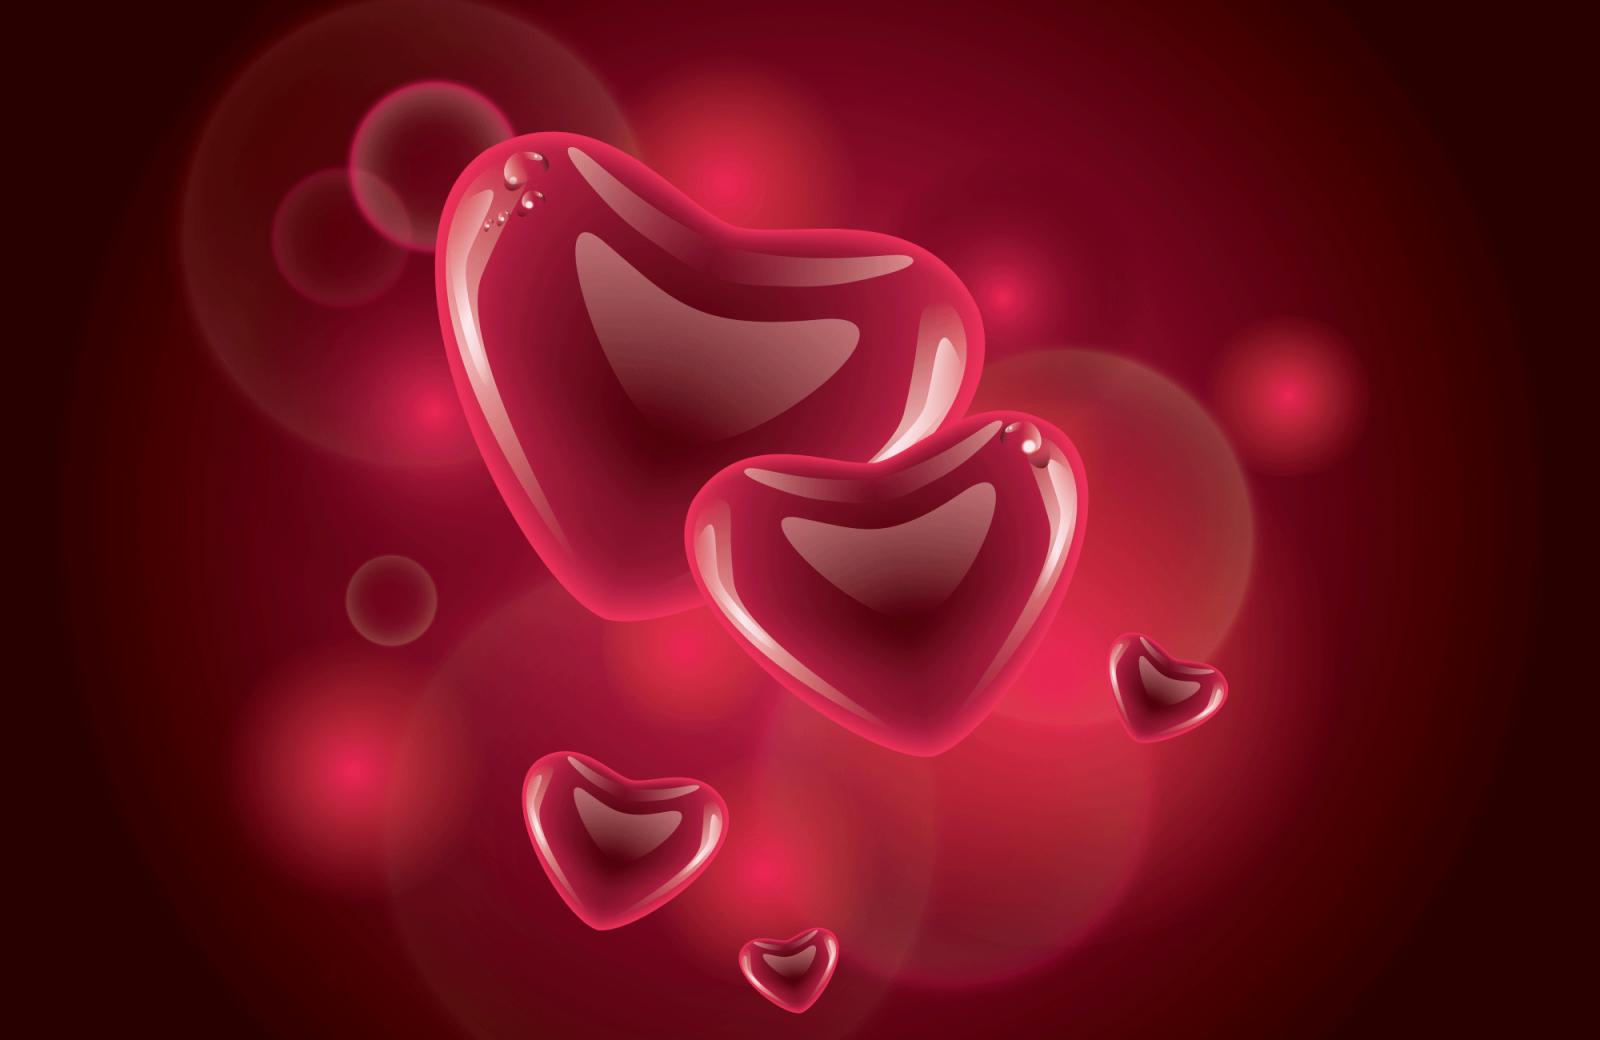 Love Wallpapers Hd Amor Fondos De Pantalla Love 3d